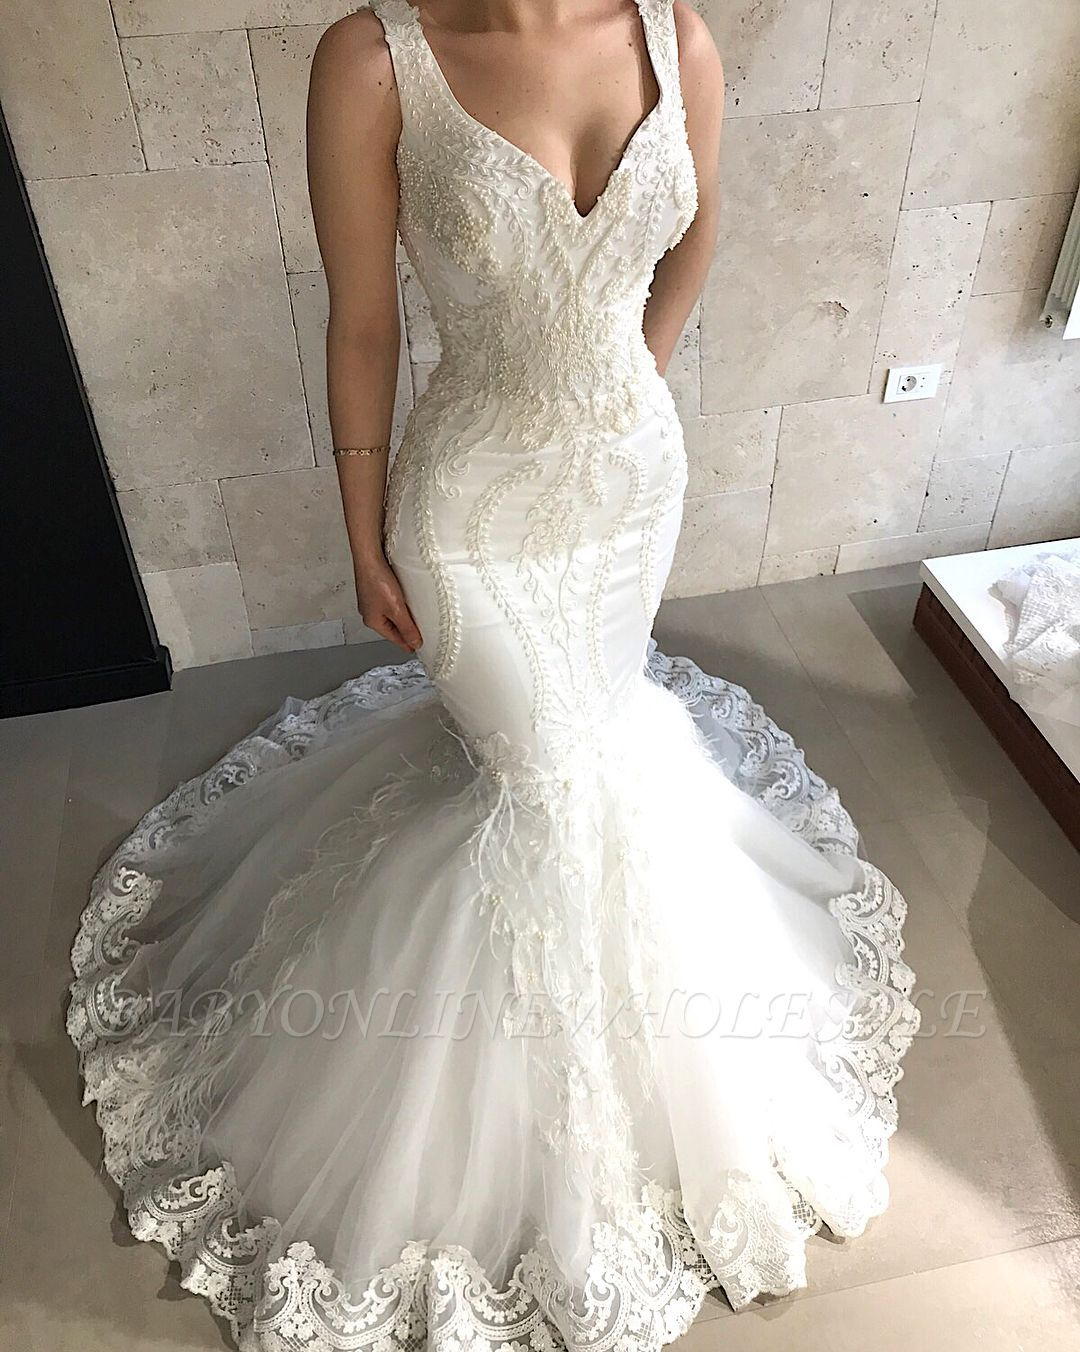 Sophia Tolli Fall 2017 Bridal Sleeveless Thick Strap V Neck Full Embellishment Elegant Fit And Flare Wedding Dresses V Neck Wedding Dress Fitted Wedding Dress [ 1800 x 900 Pixel ]